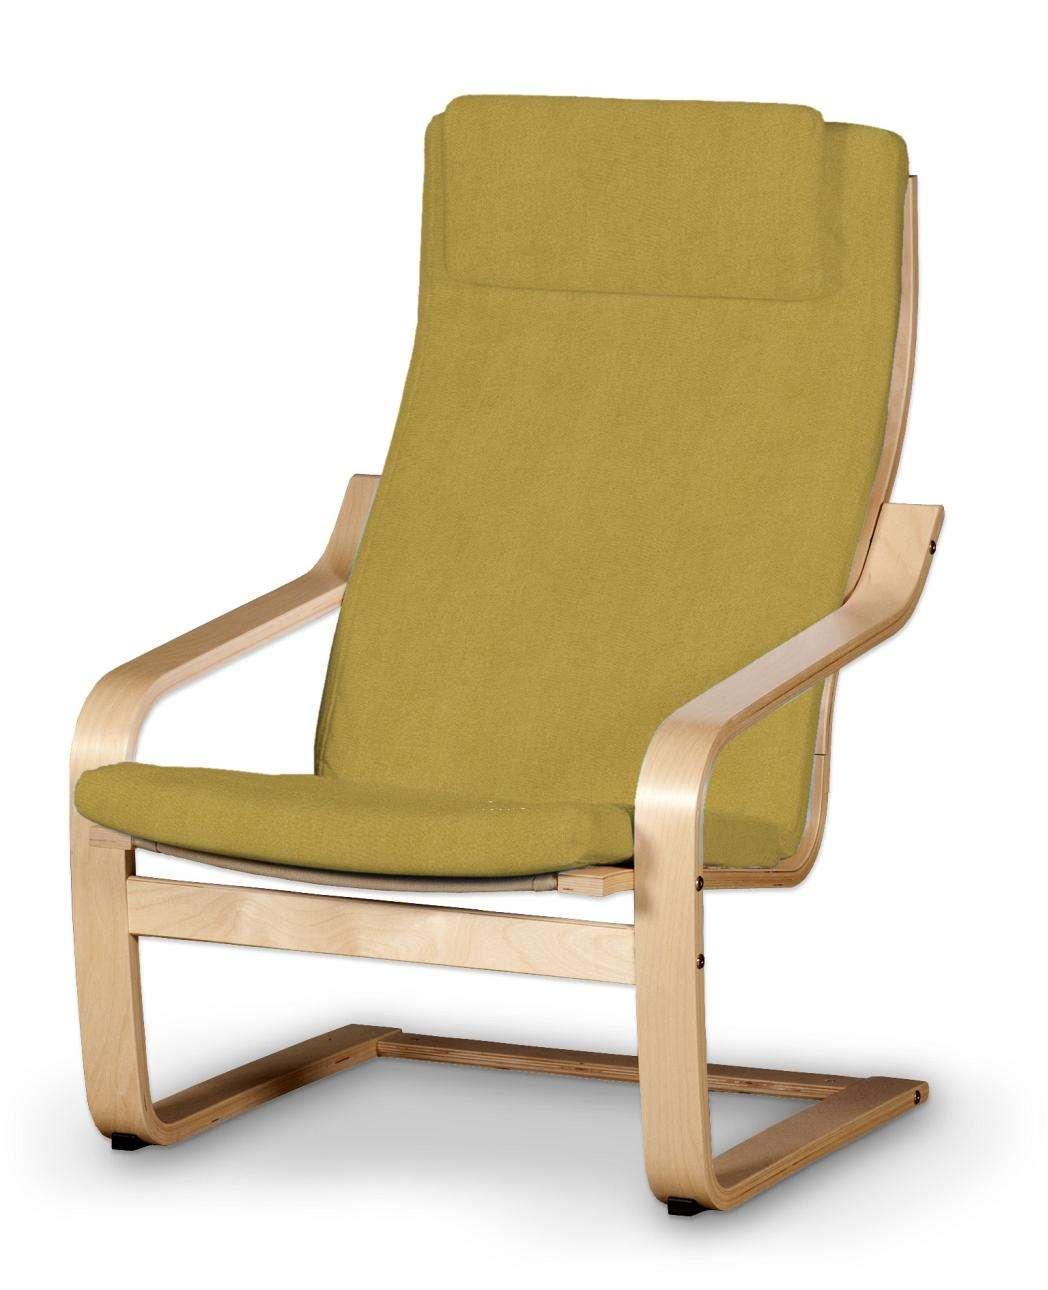 Poduszka na fotel Poäng II Fotel Poäng II w kolekcji Etna , tkanina: 705-04